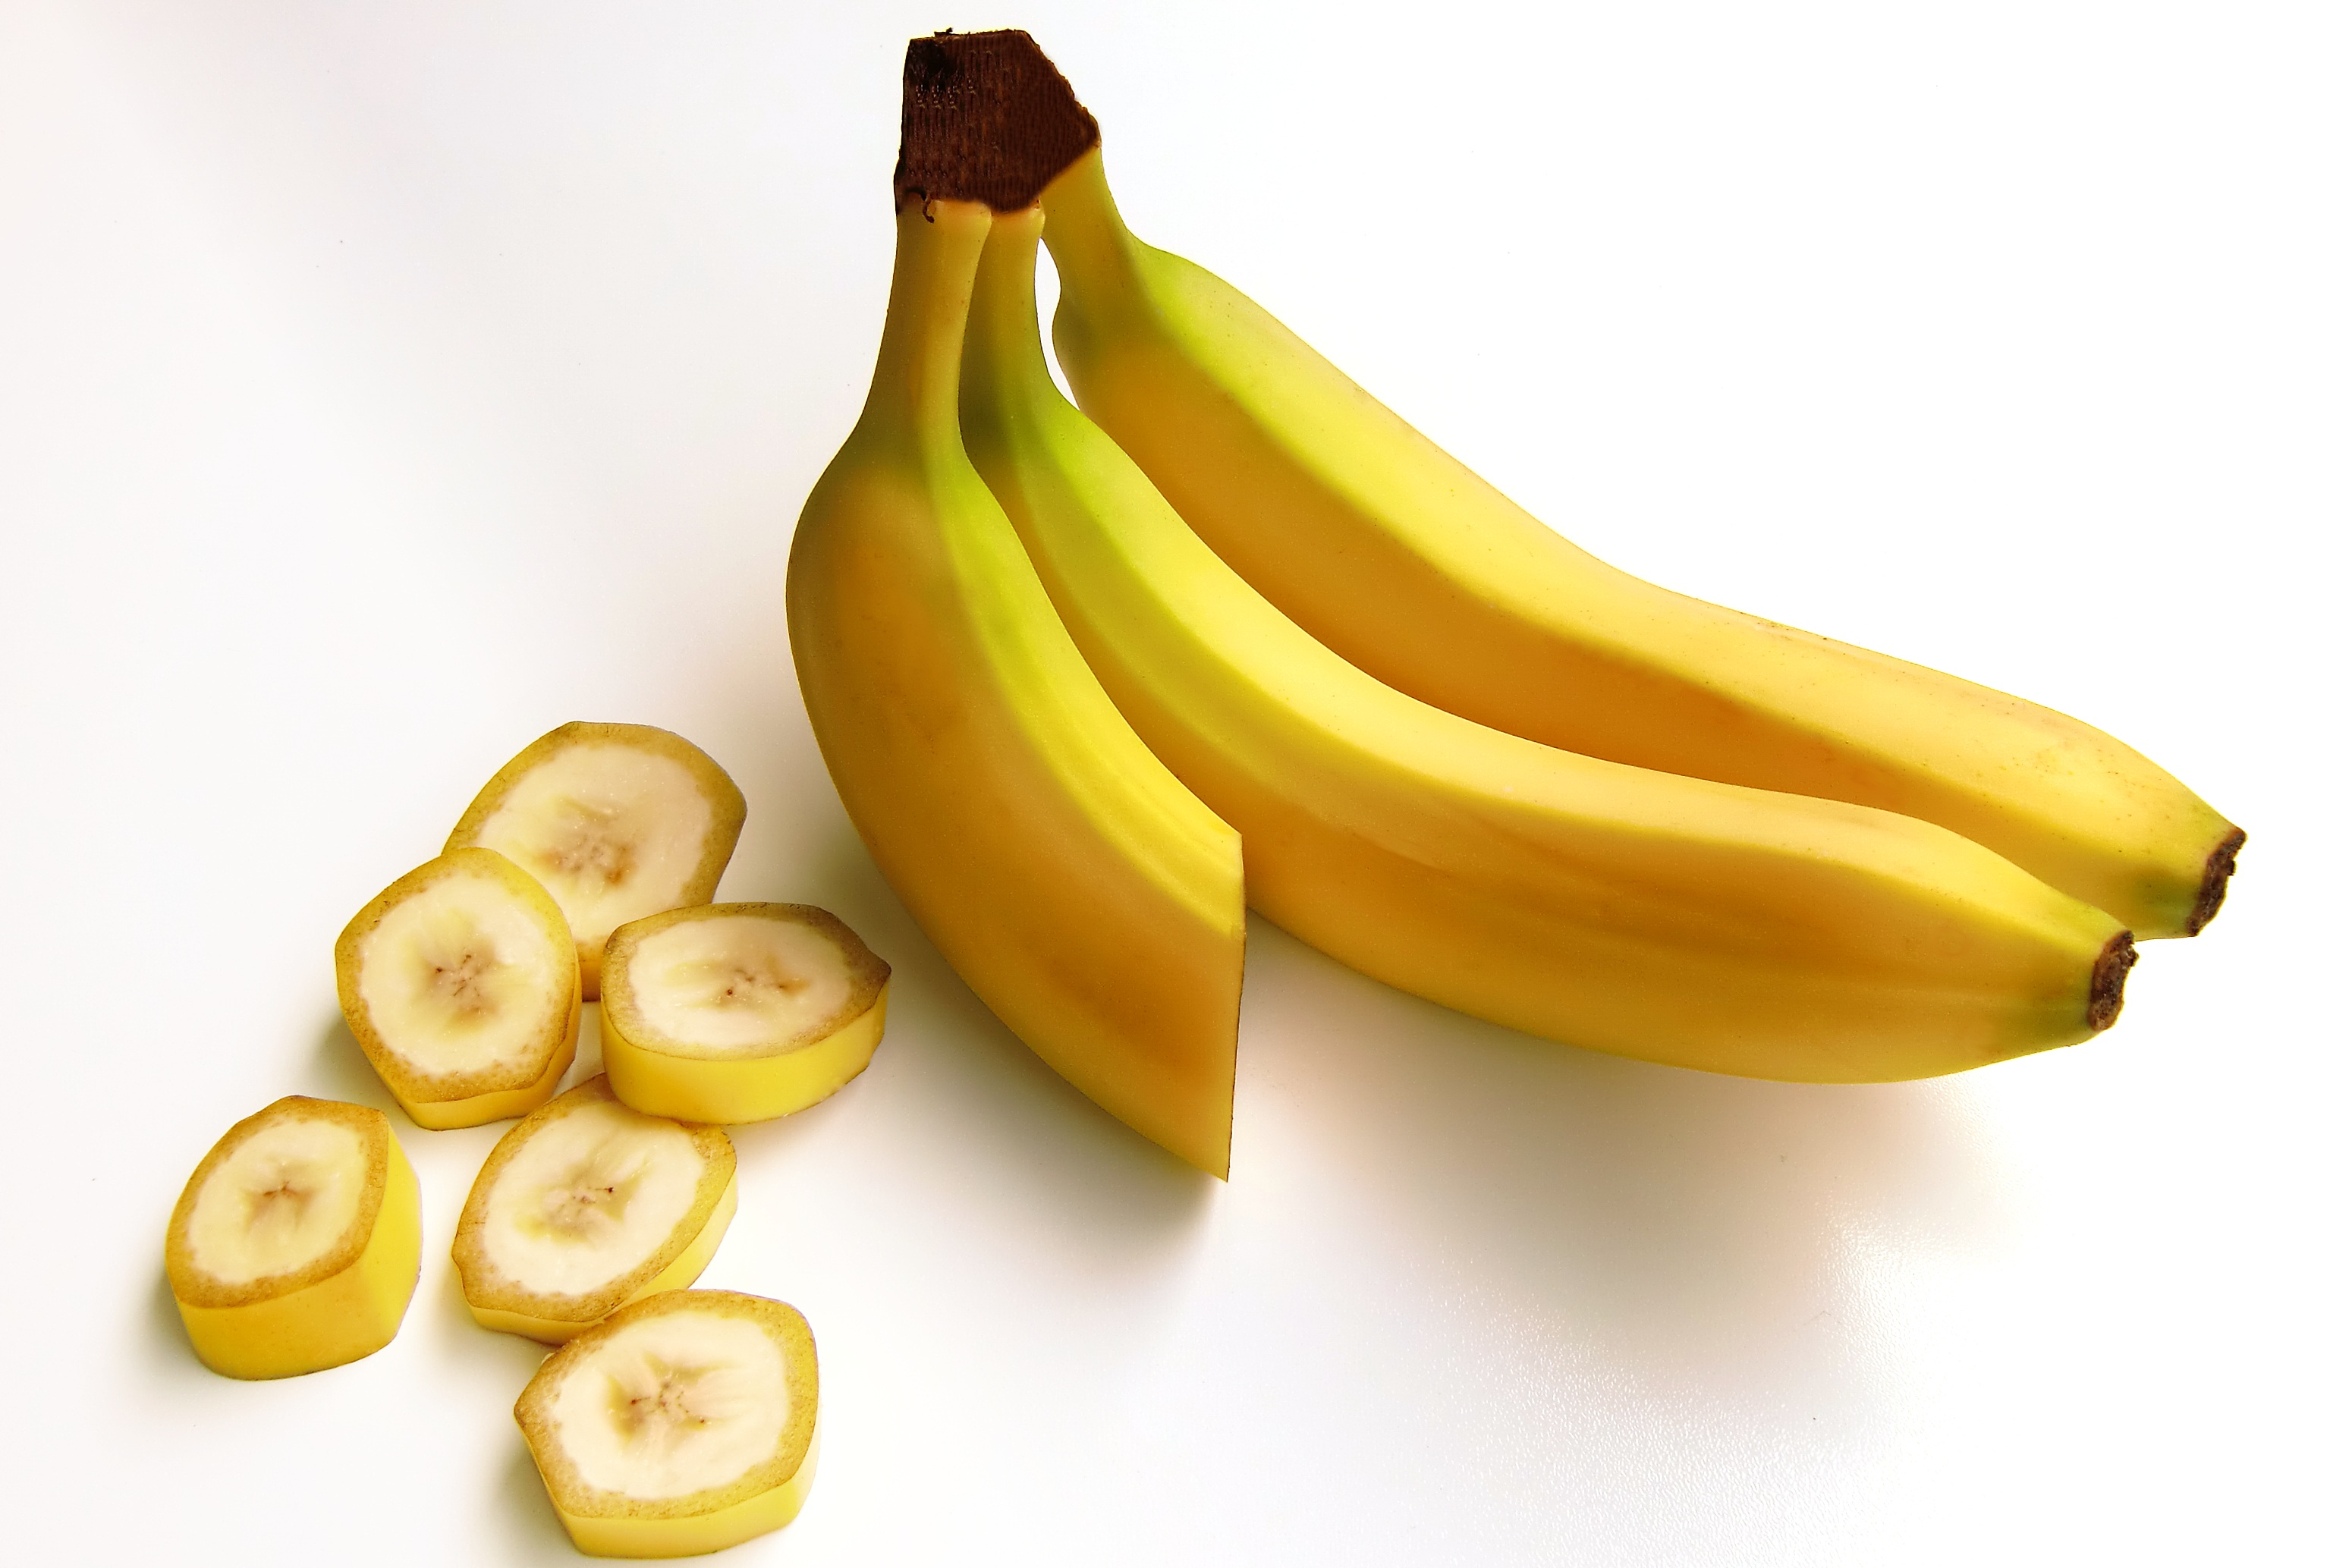 Yellow Banana Fruit · Free Stock Photo